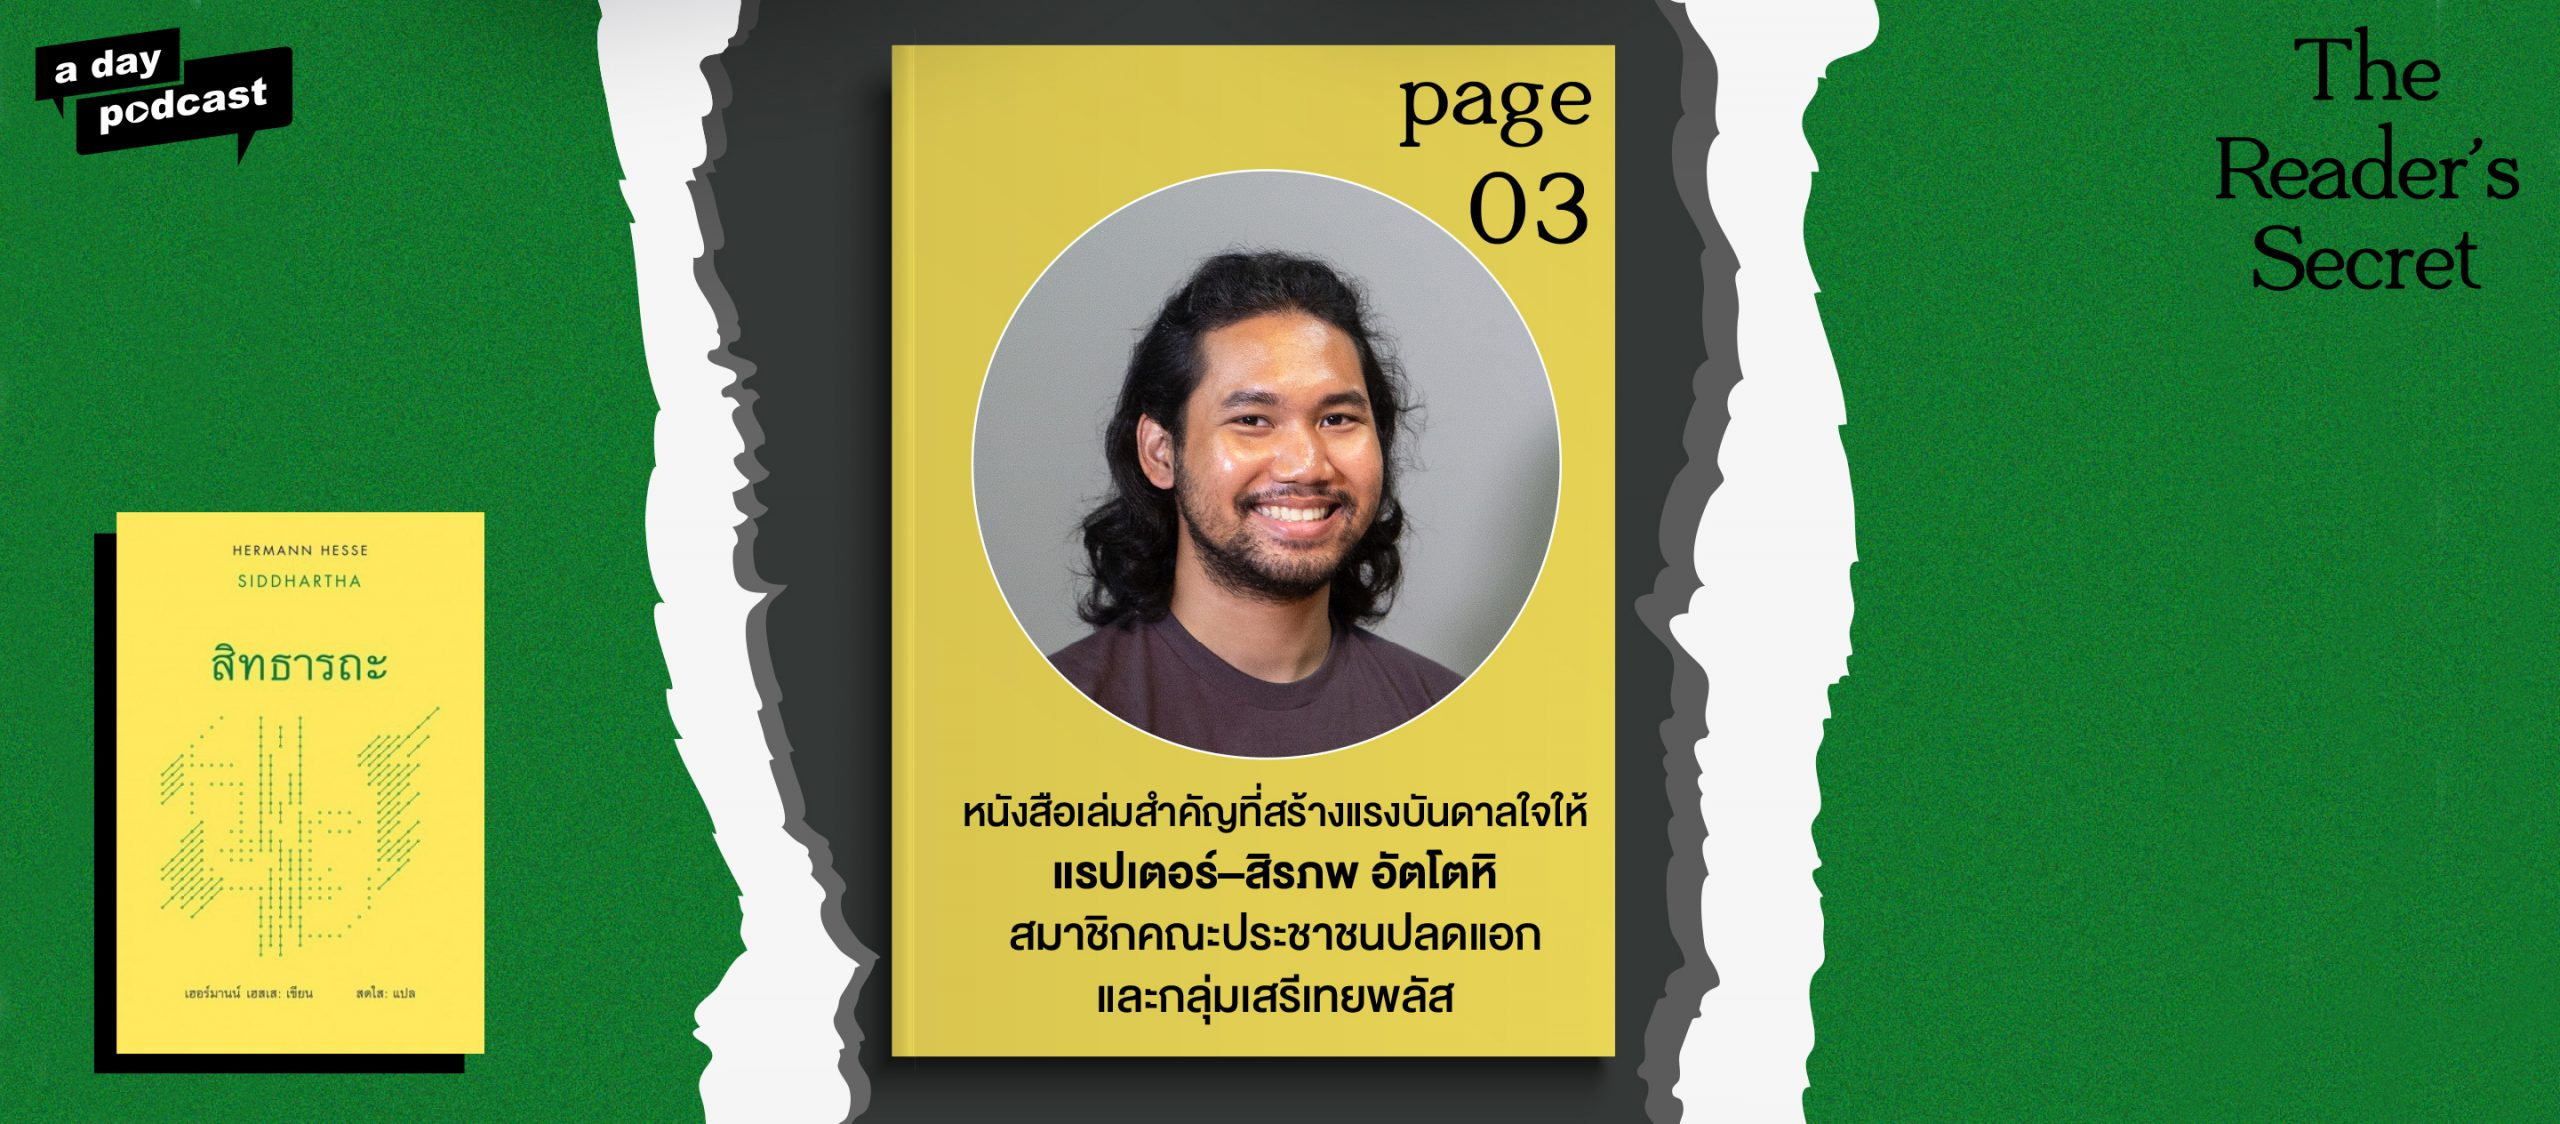 The Reader's Secret EP.03 หนังสือเล่มสำคัญของ 'แรปเตอร์' สมาชิกคณะประชาชนปลดแอกและกลุ่มเสรีเทยพลัส